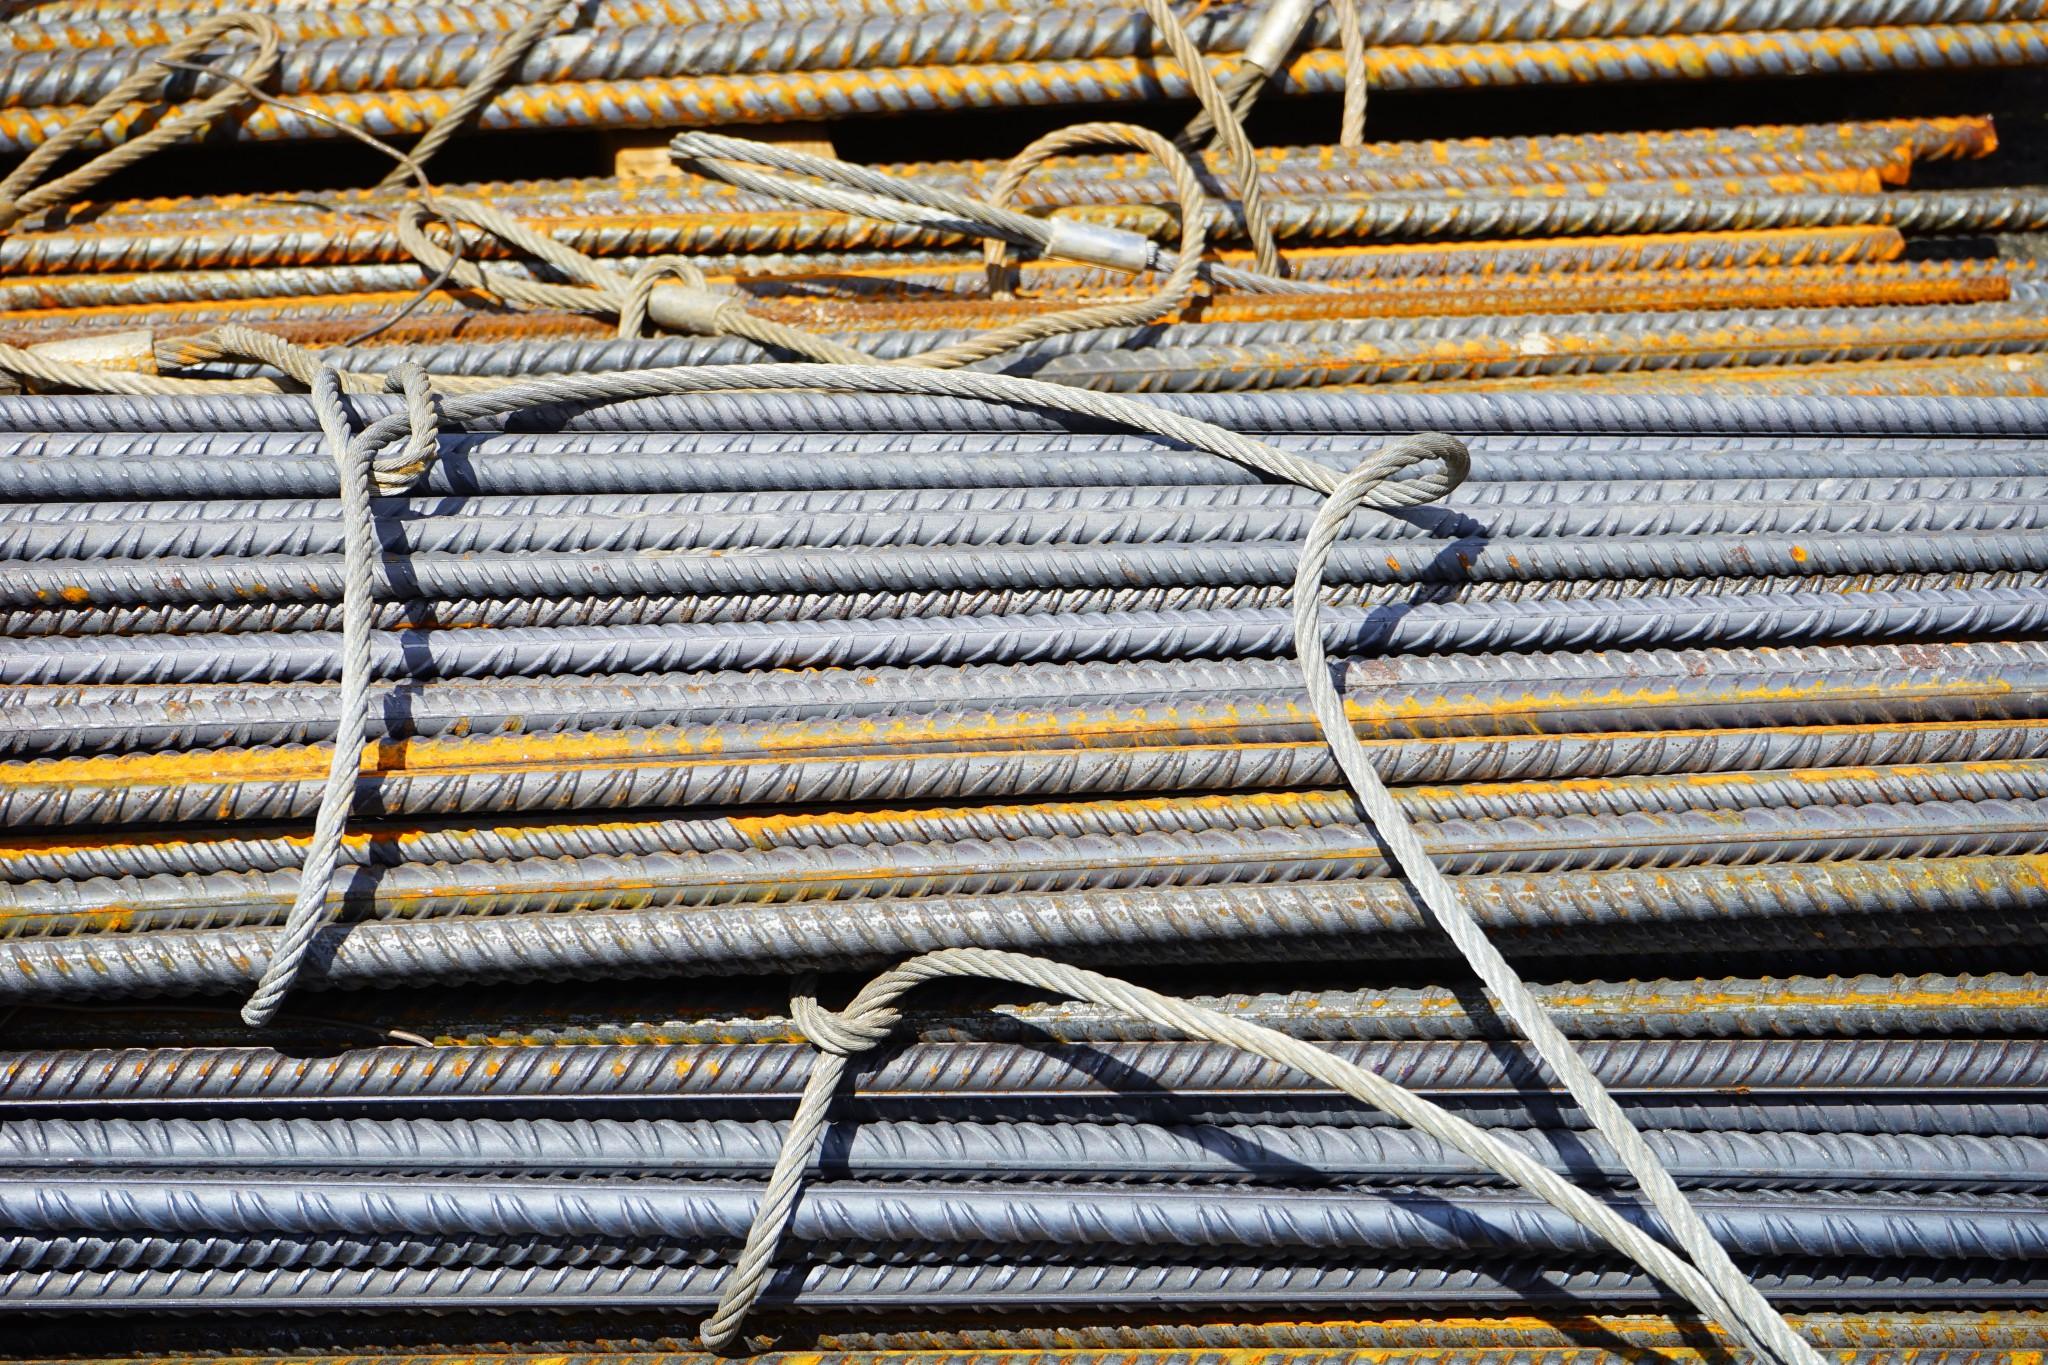 track-steel-line-metal-material-building-material-780251-pxhere.com